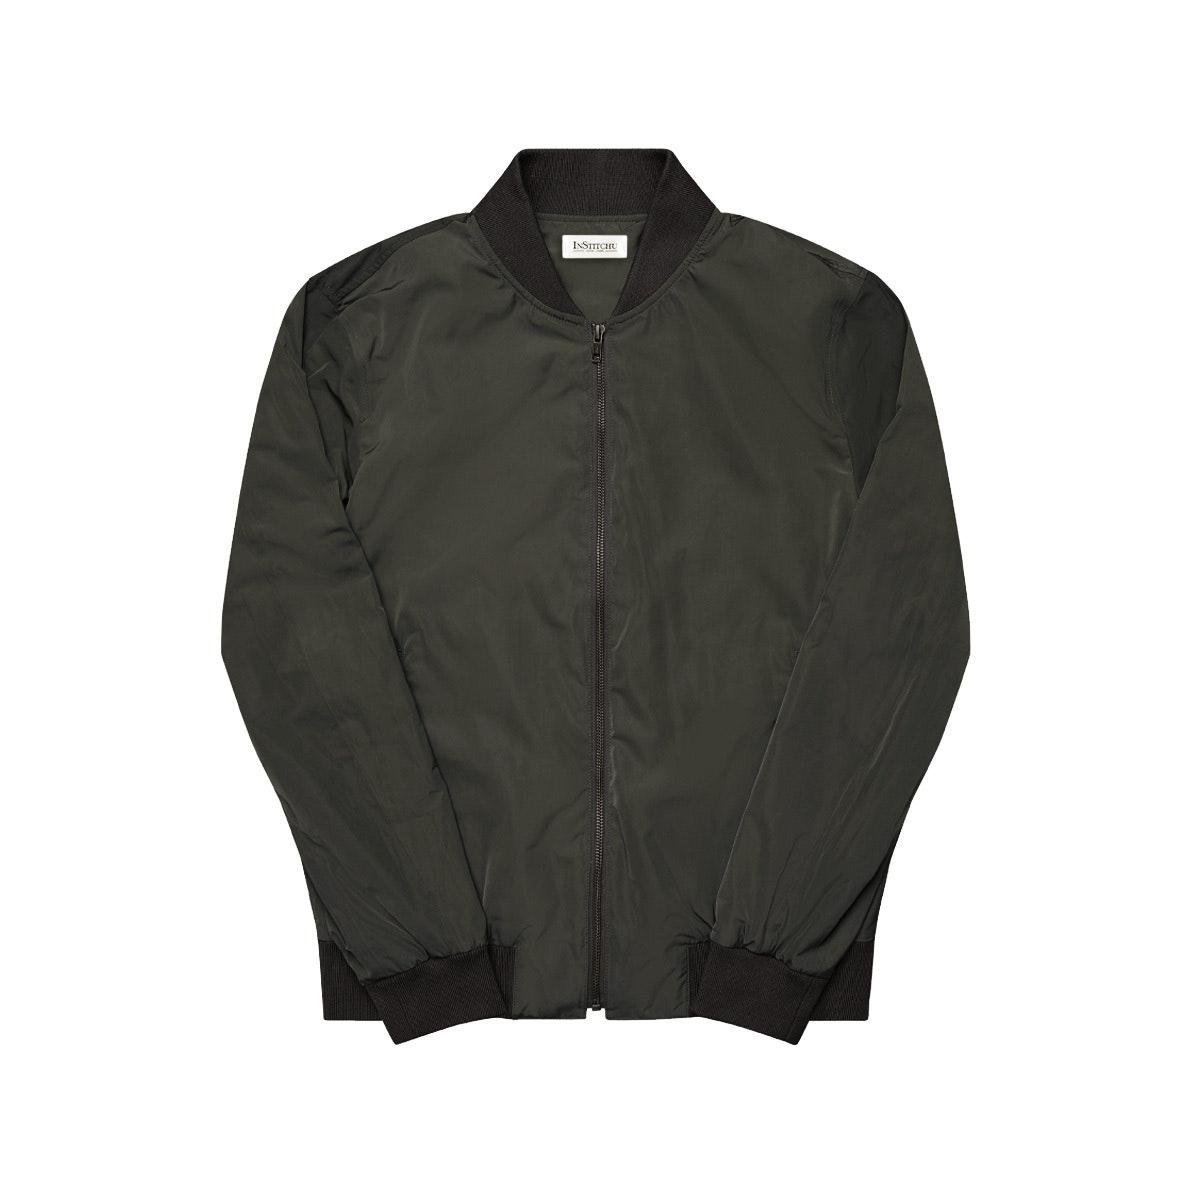 The Cheshire Grey Bomber Jacket